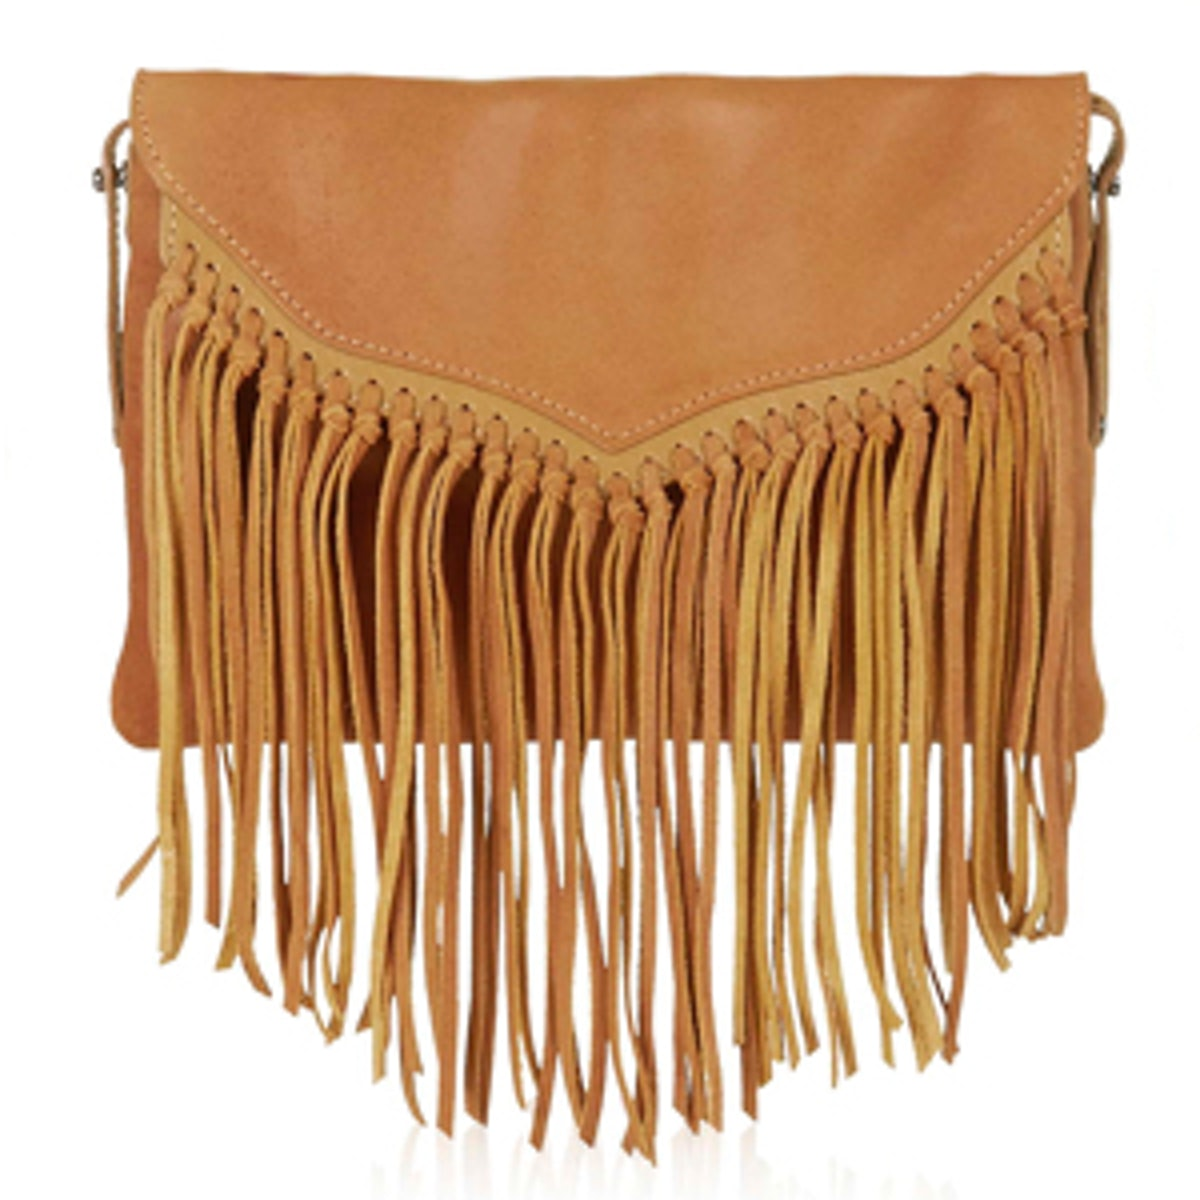 Leather Tassel Crossbody Bag